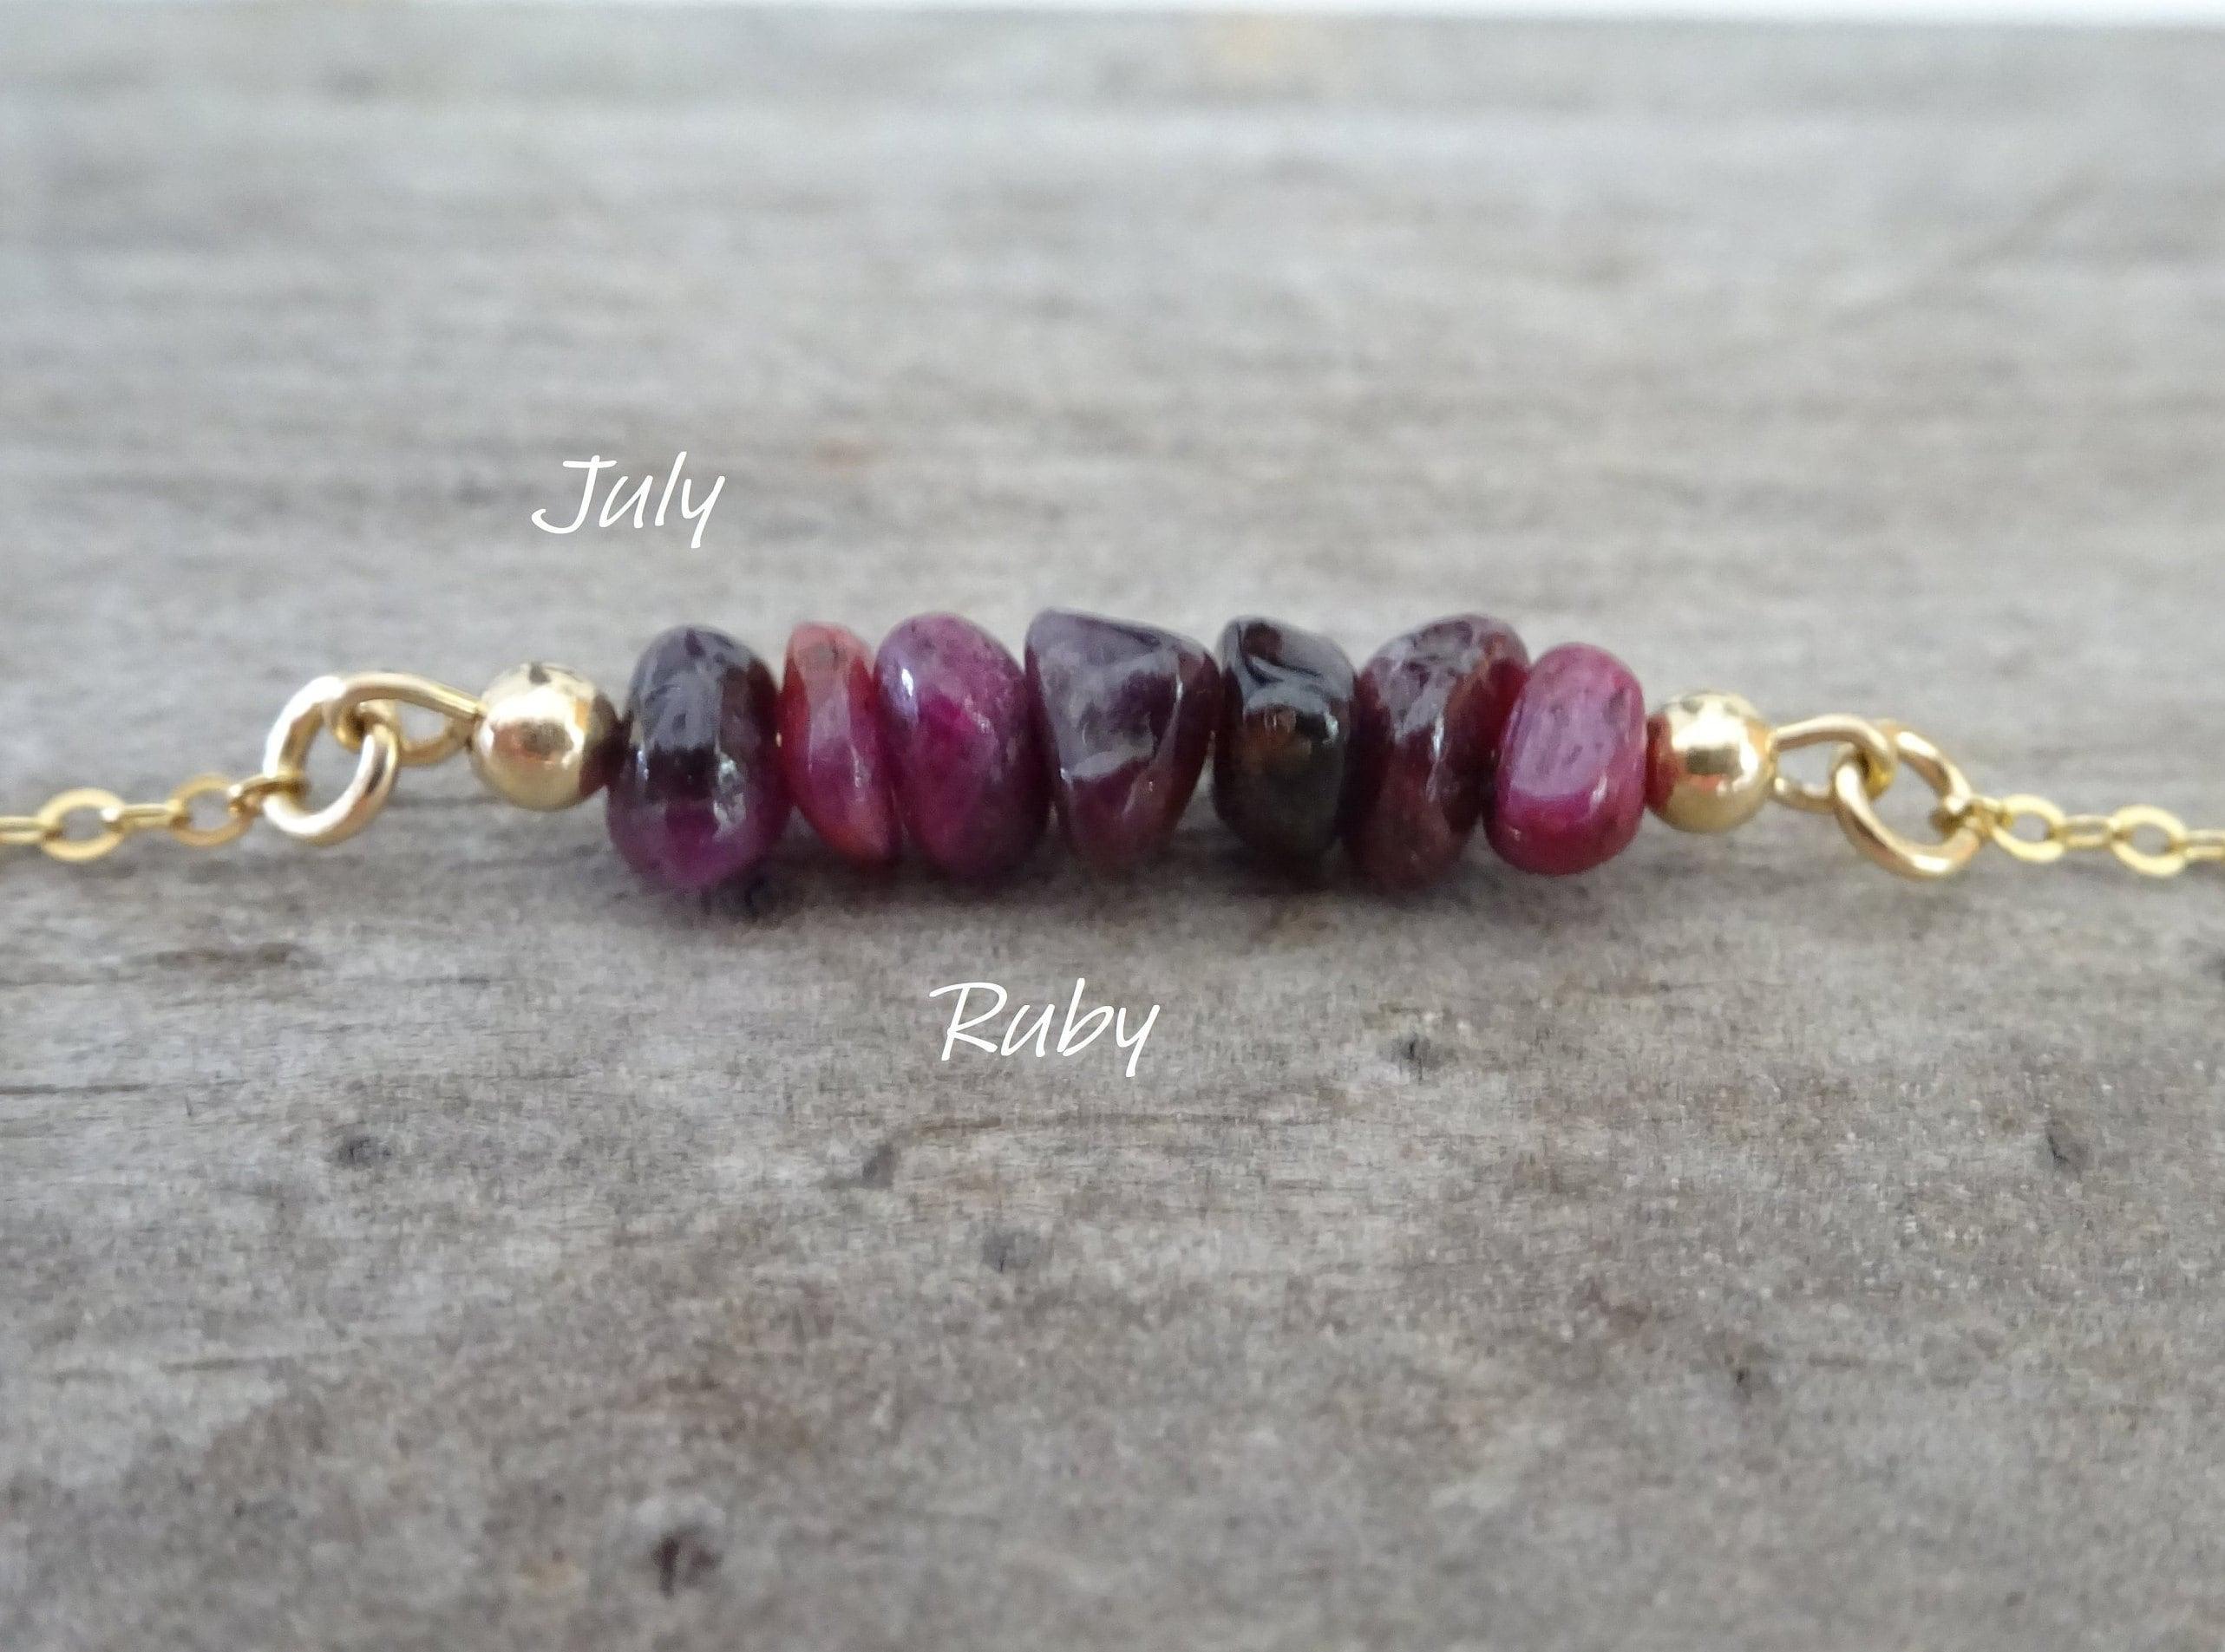 Raw Ruby Necklace July Birthstone Birthday Gift For Cancer Zodiac Gemstone Bar Stone Jewelry Healing Stones